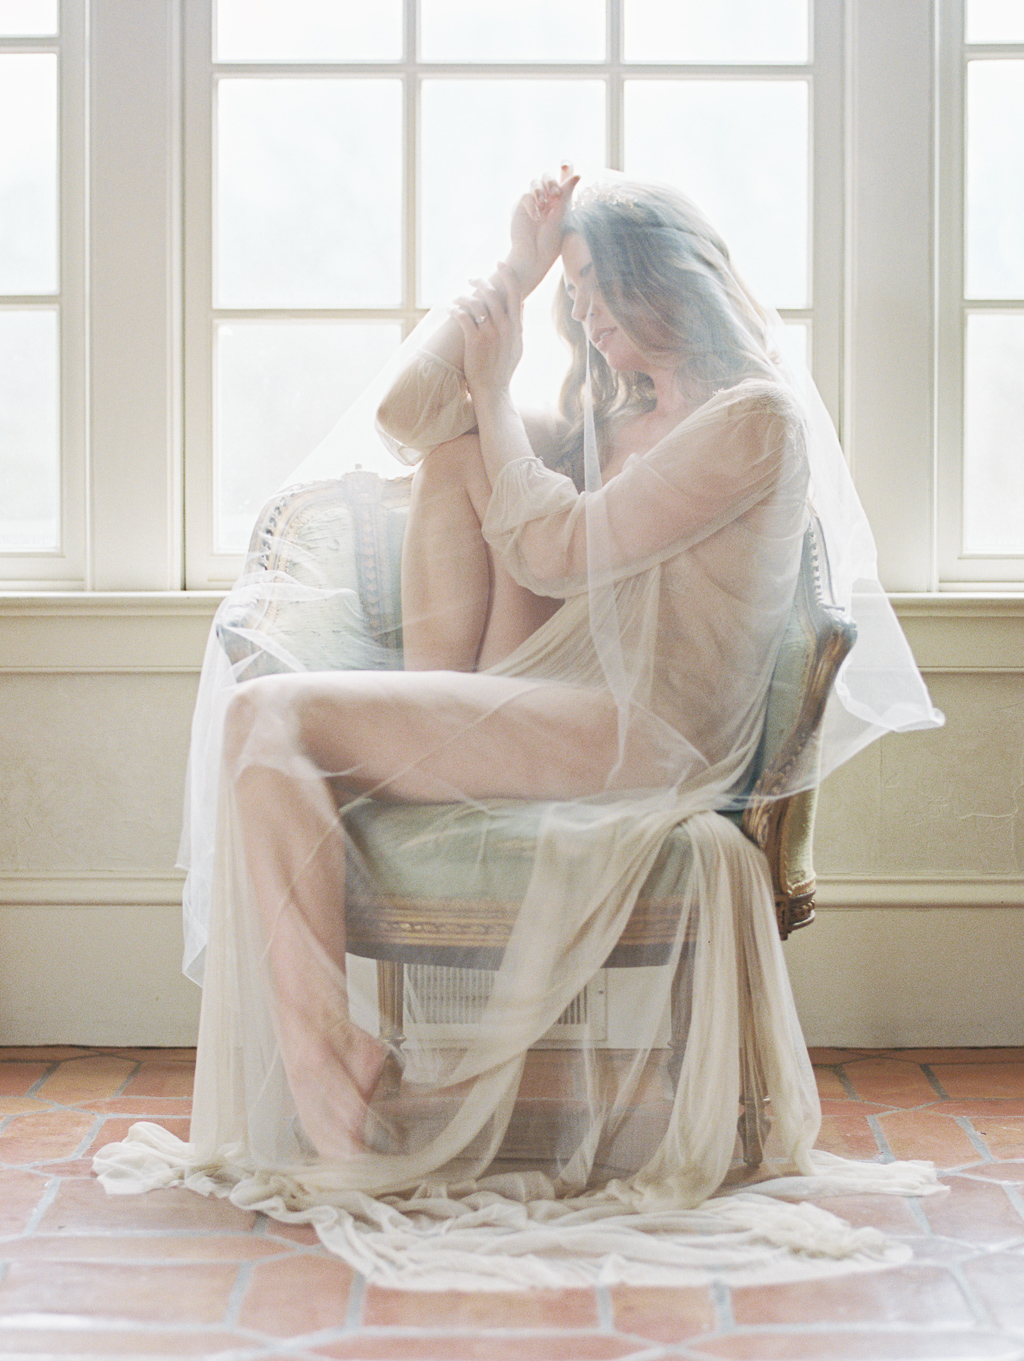 nicole-colwell-workshop-boudoir-021-web.jpg